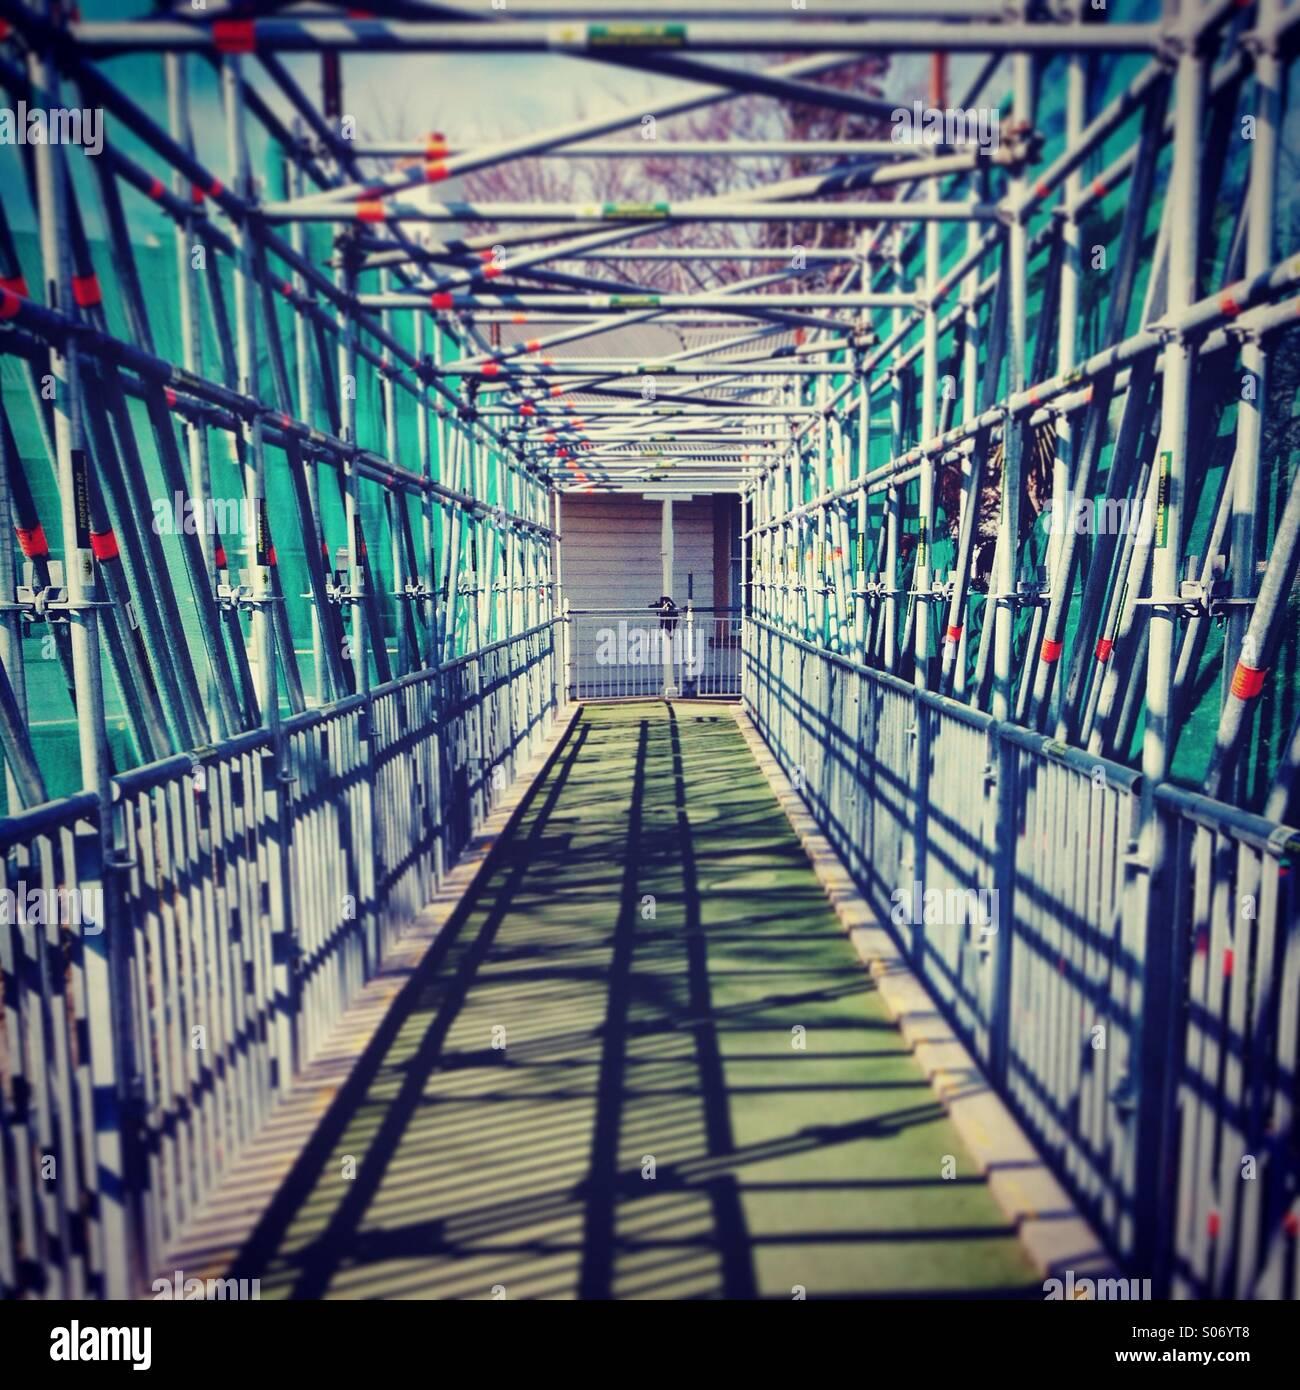 Bridge under construction - Stock Image